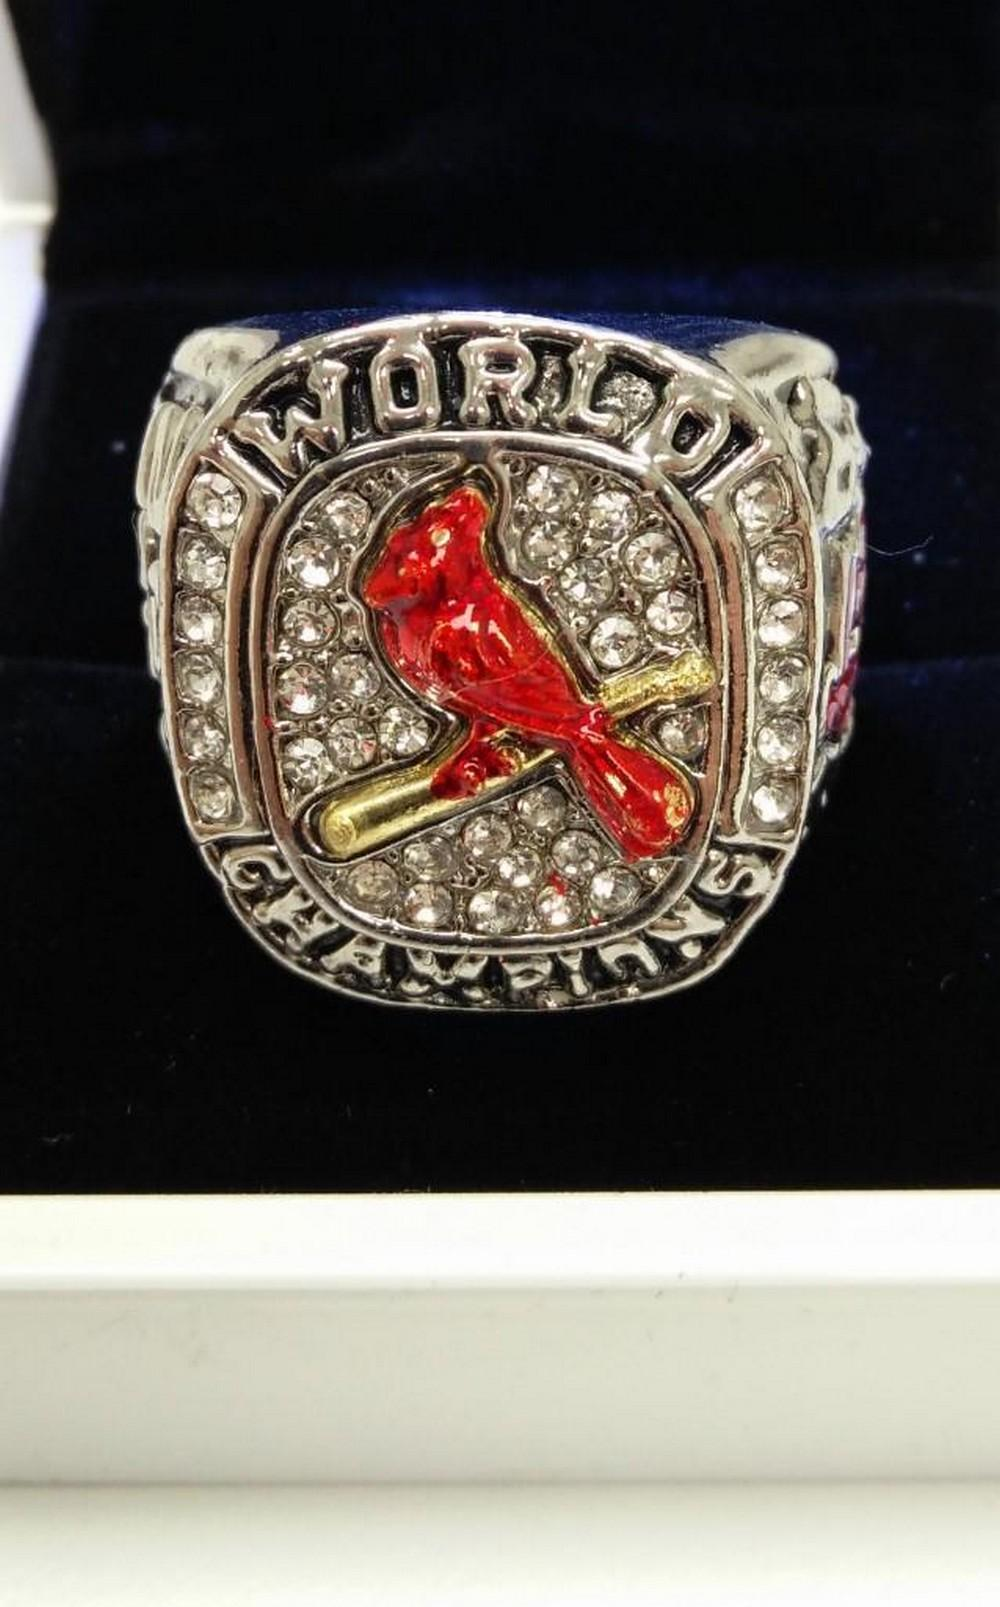 St. Louis Cardinals 2011 Championship Ring